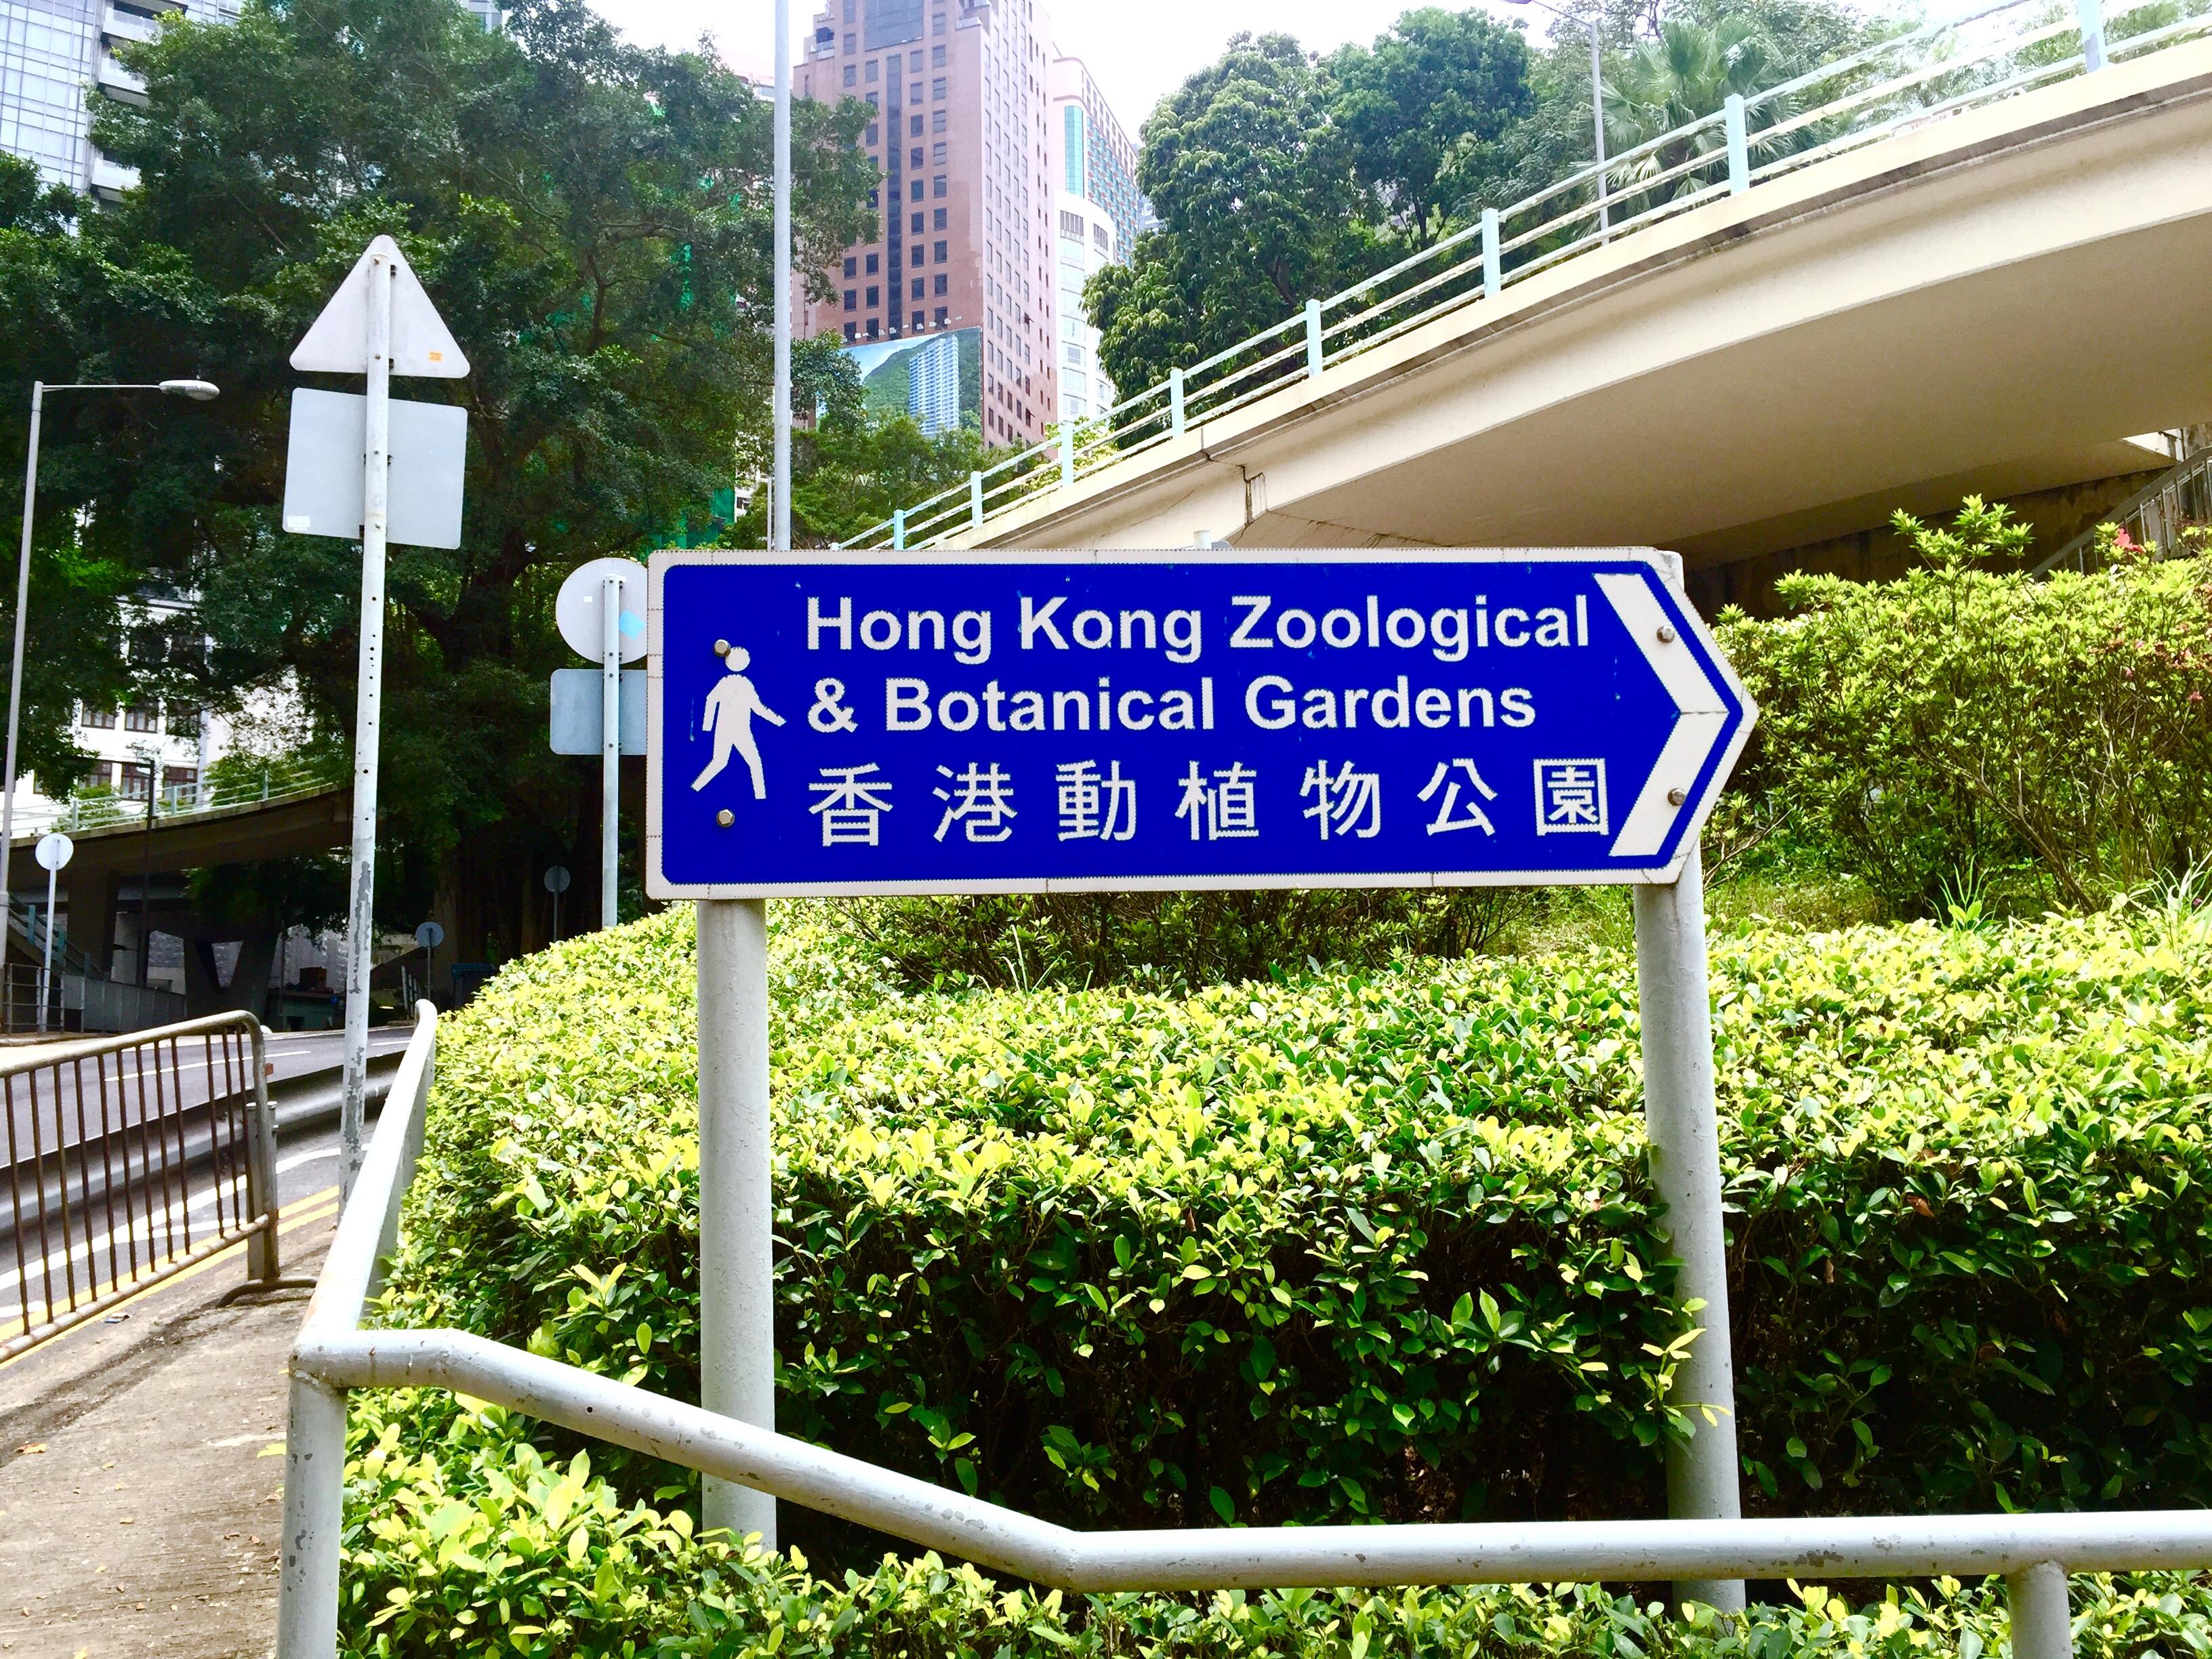 #hkig #hongkong